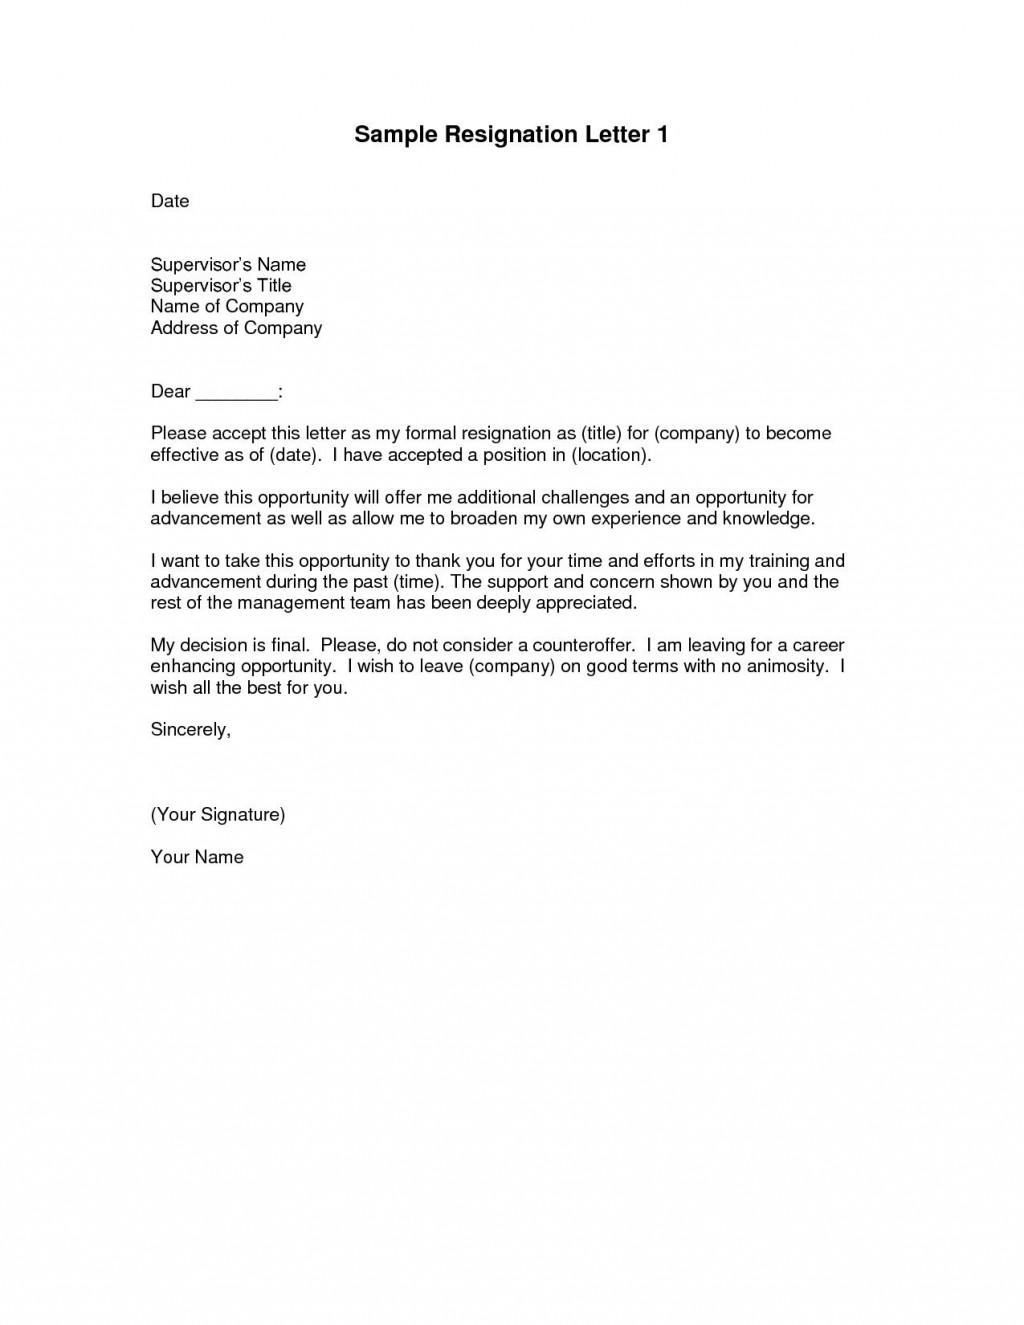 000 Impressive Sample Resignation Letter Template Design  For Teacher Word - Free DownloadableLarge